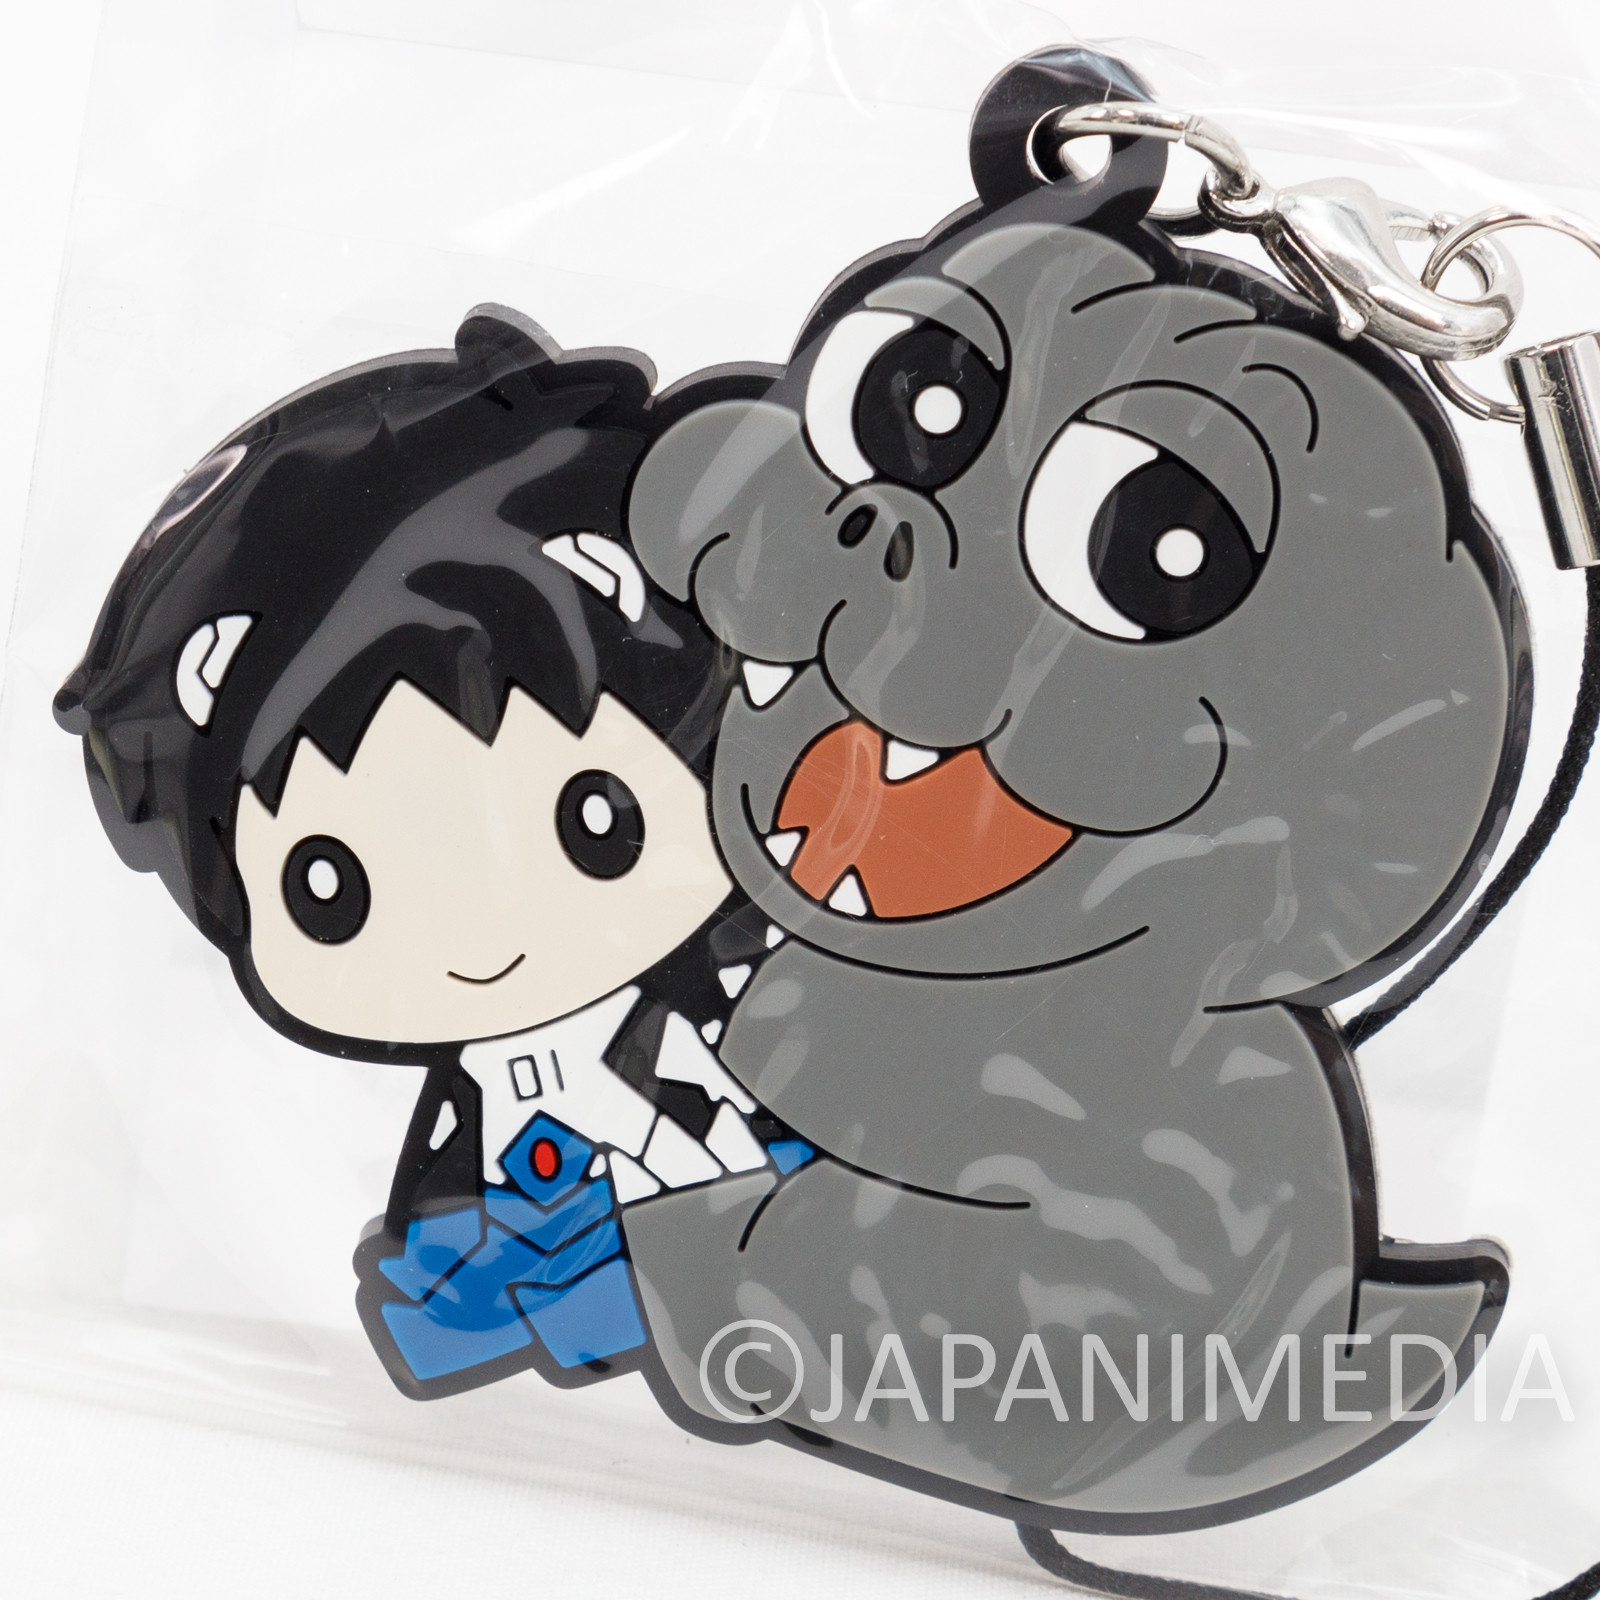 Evangelion Shinji Ikari x Minilla Mascot Rubber Strap JAPAN 2